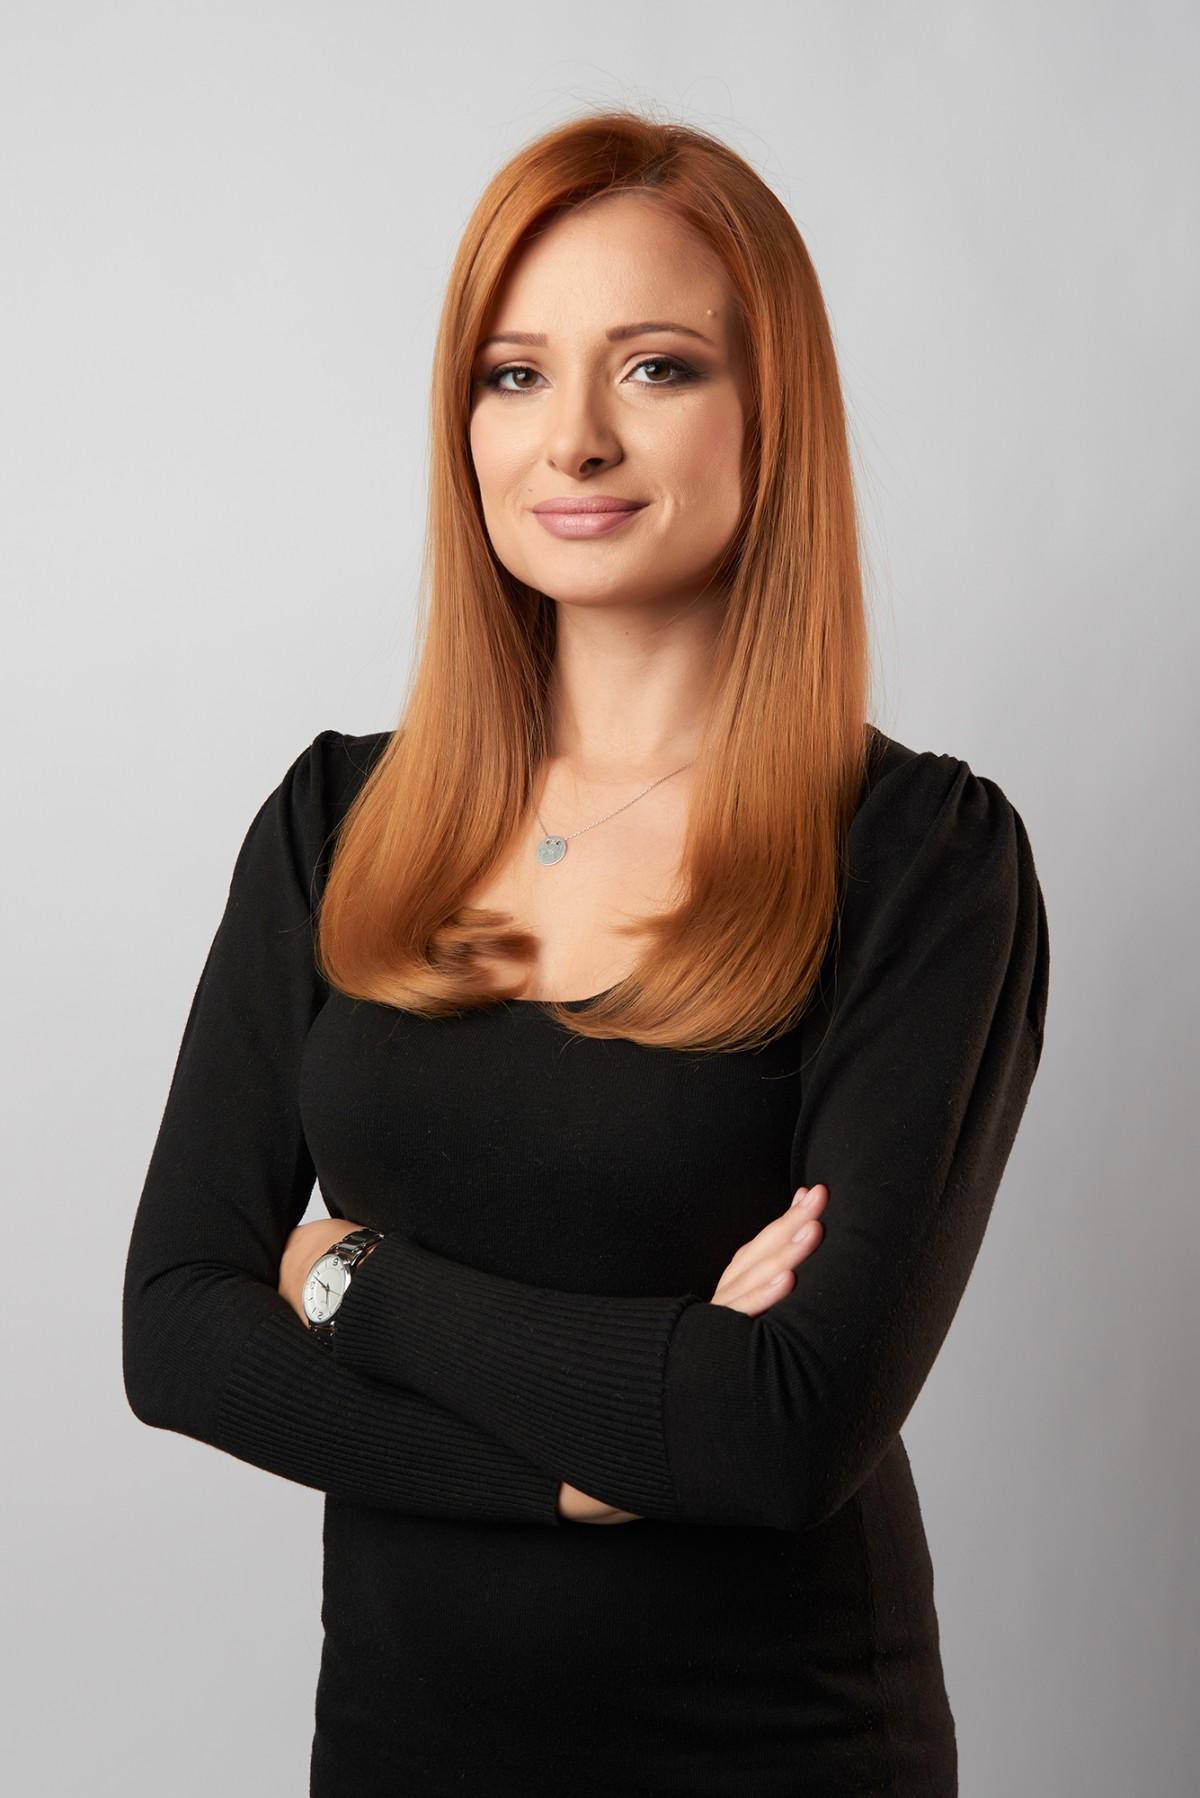 Nikolina Vujinović